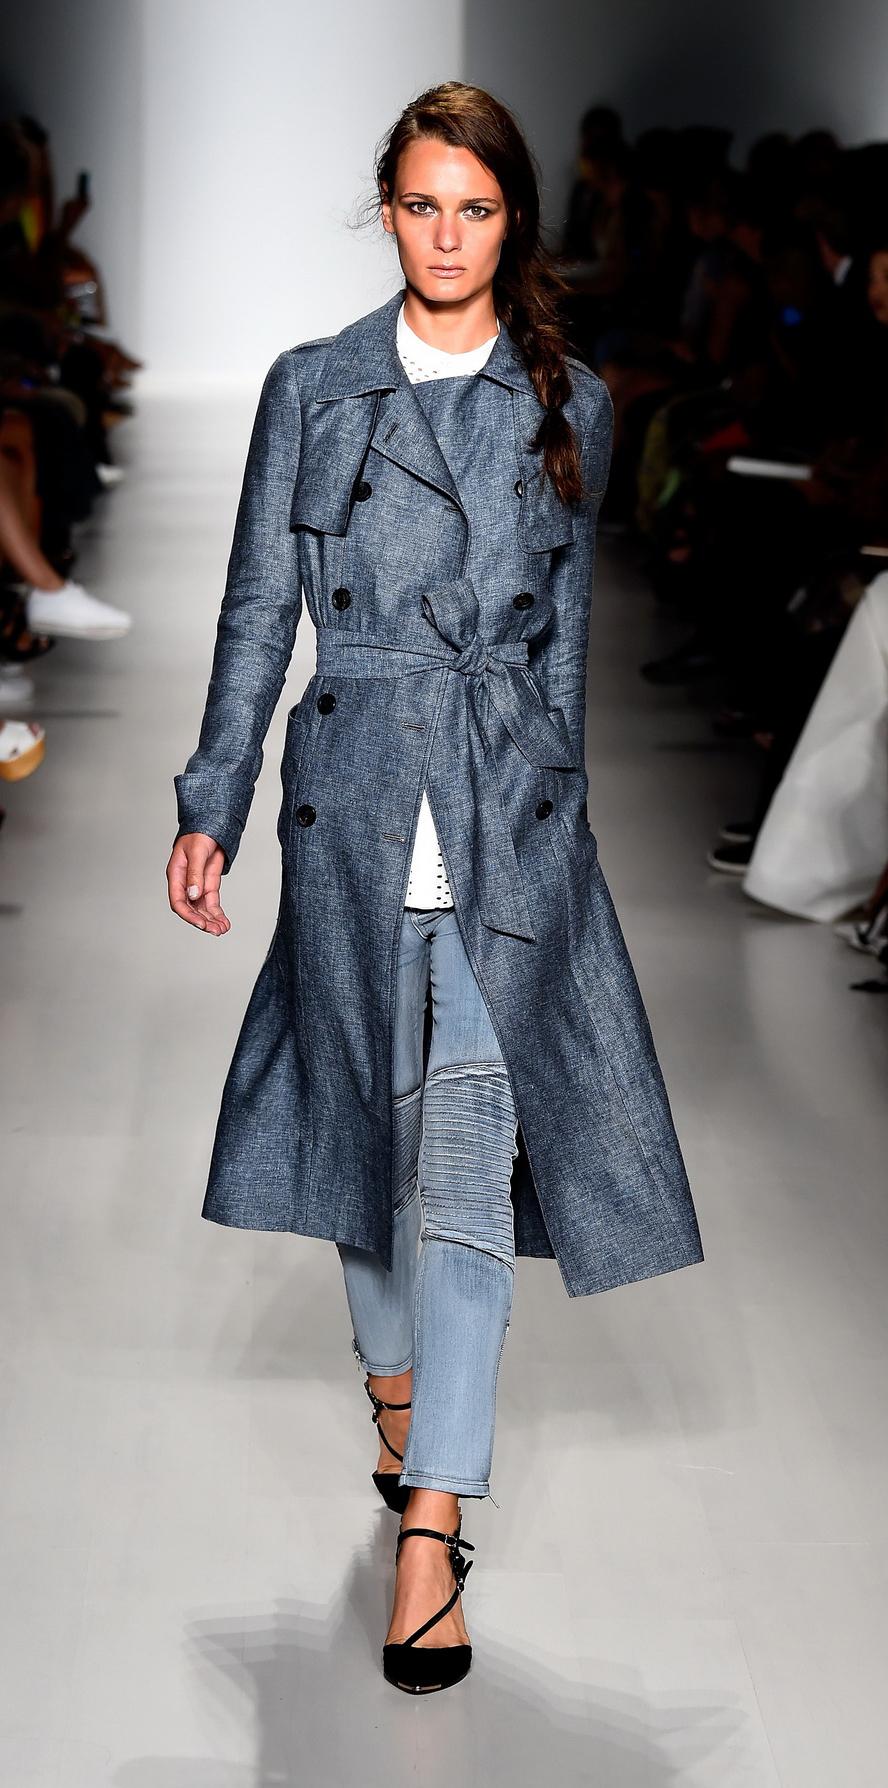 Top Jeans Fashion 2015